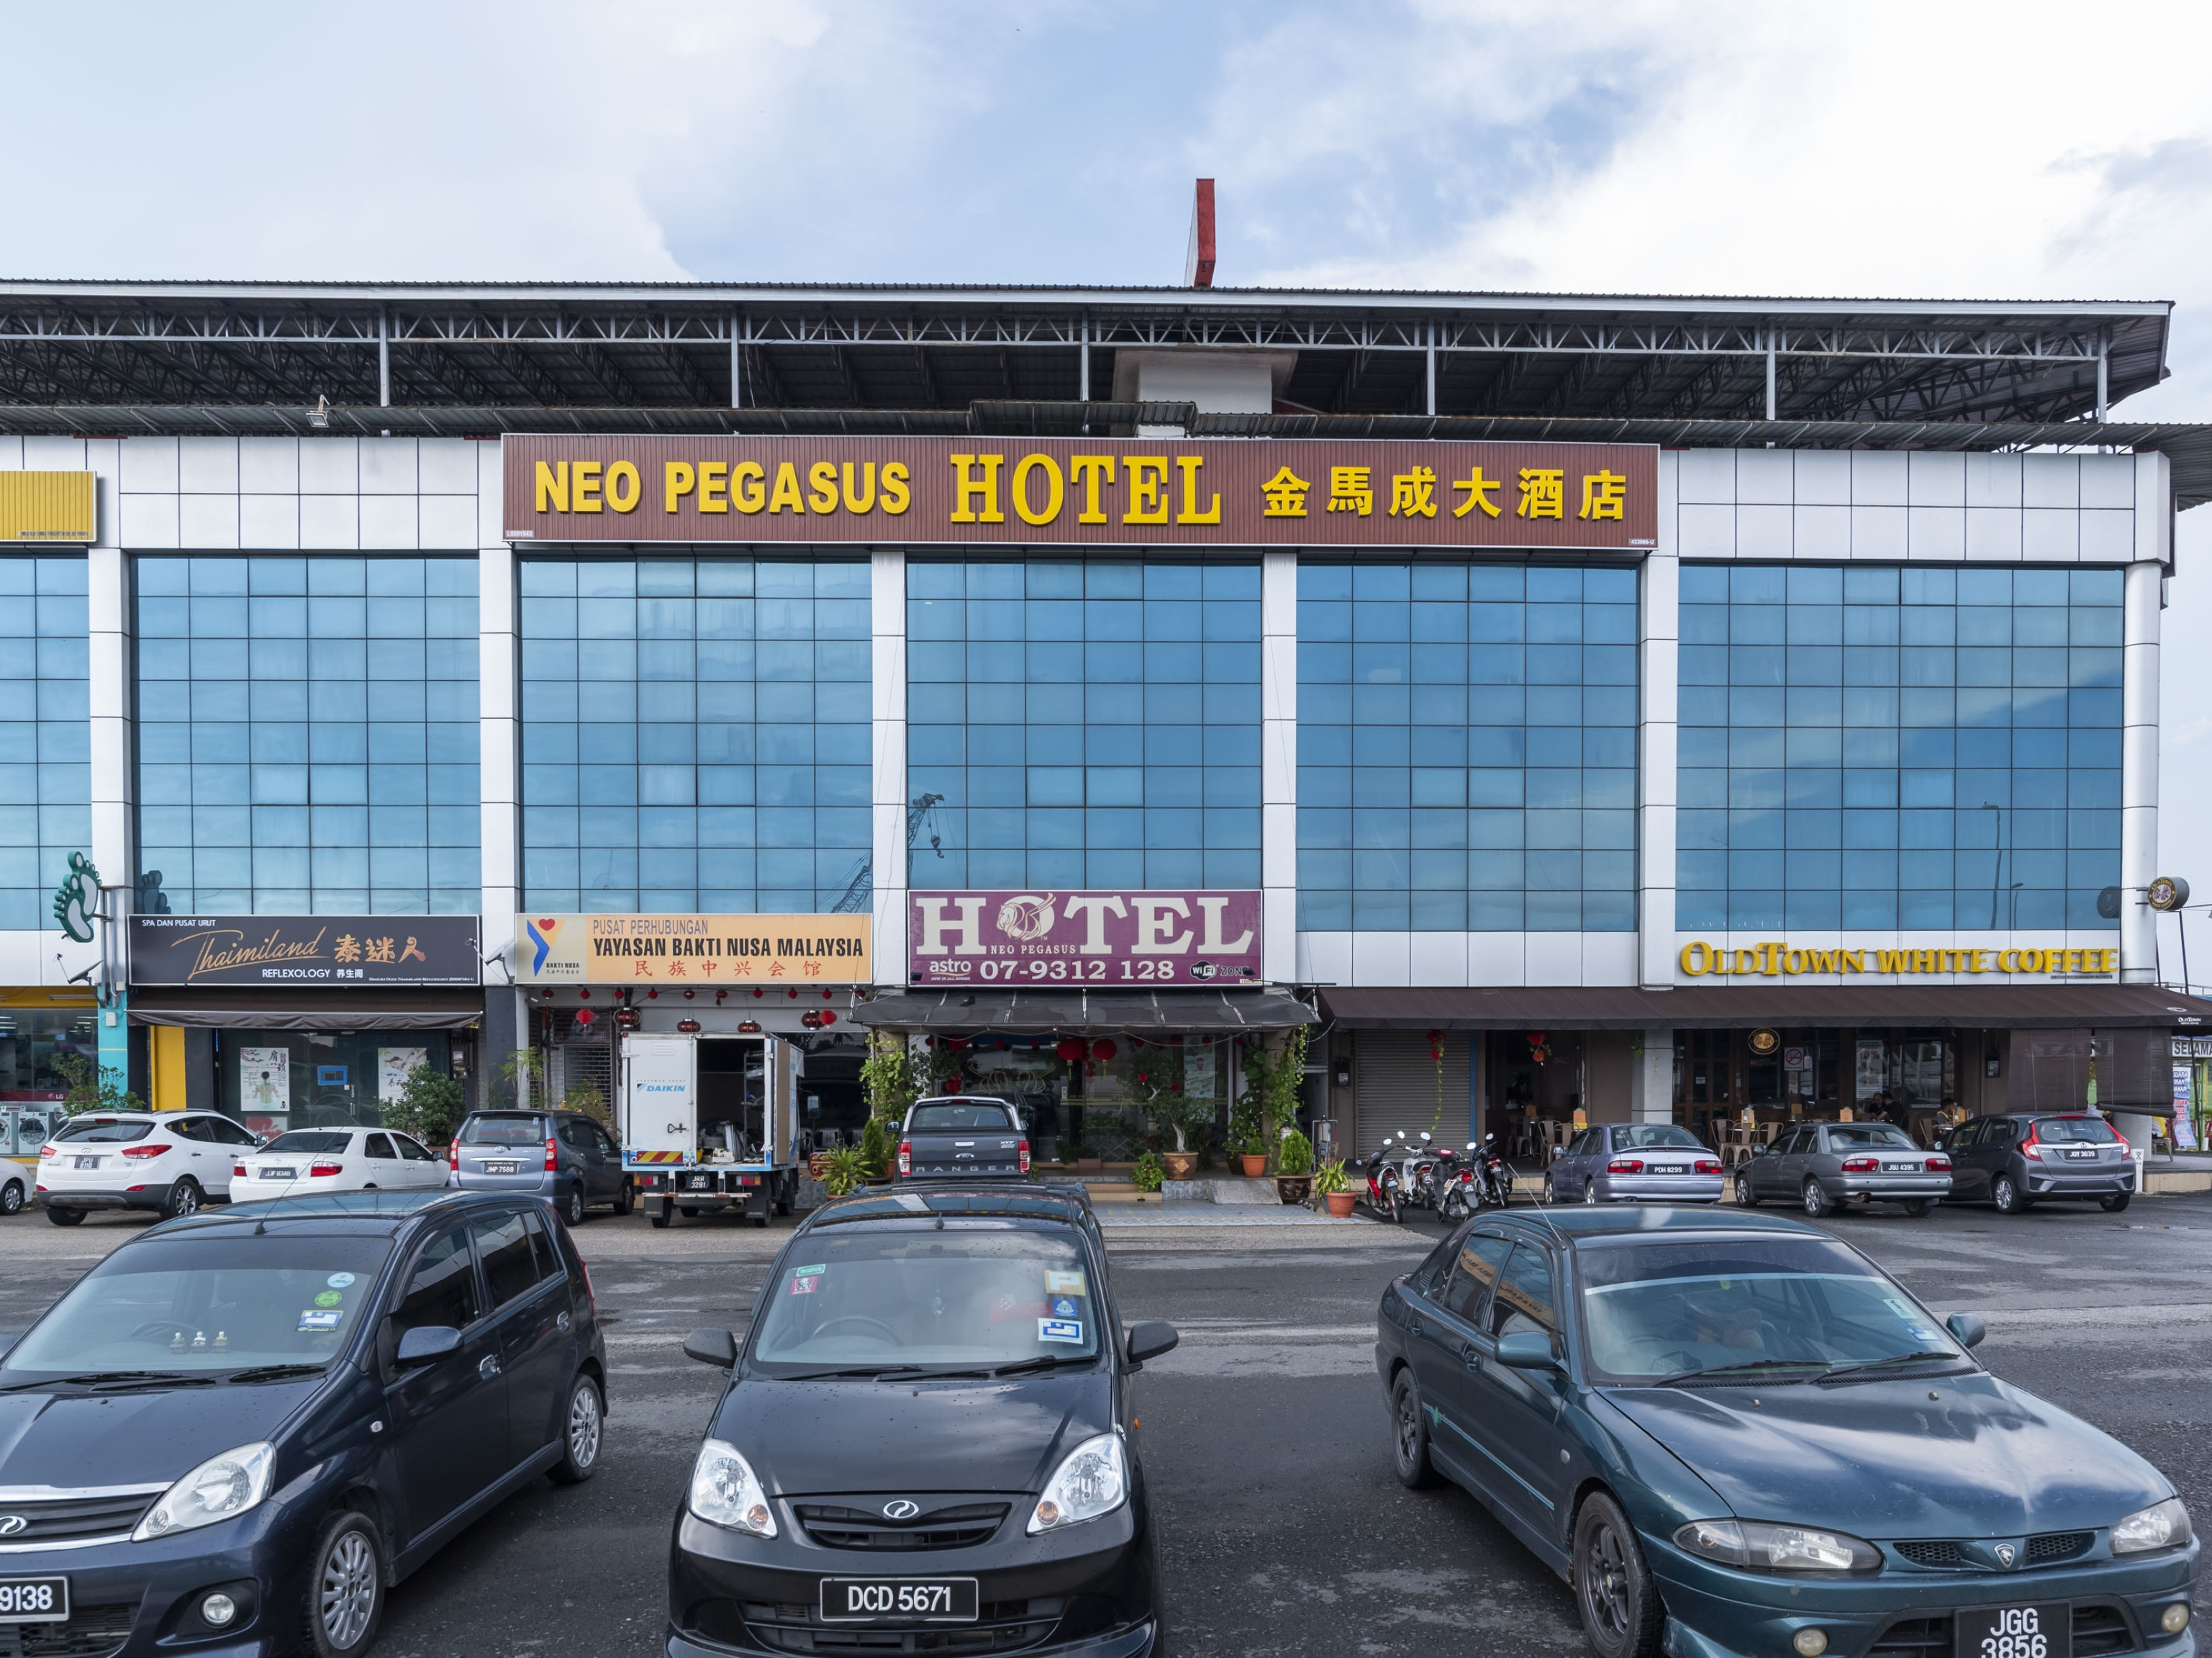 OYO 1114 Neo Pegasus Hotel, Segamat